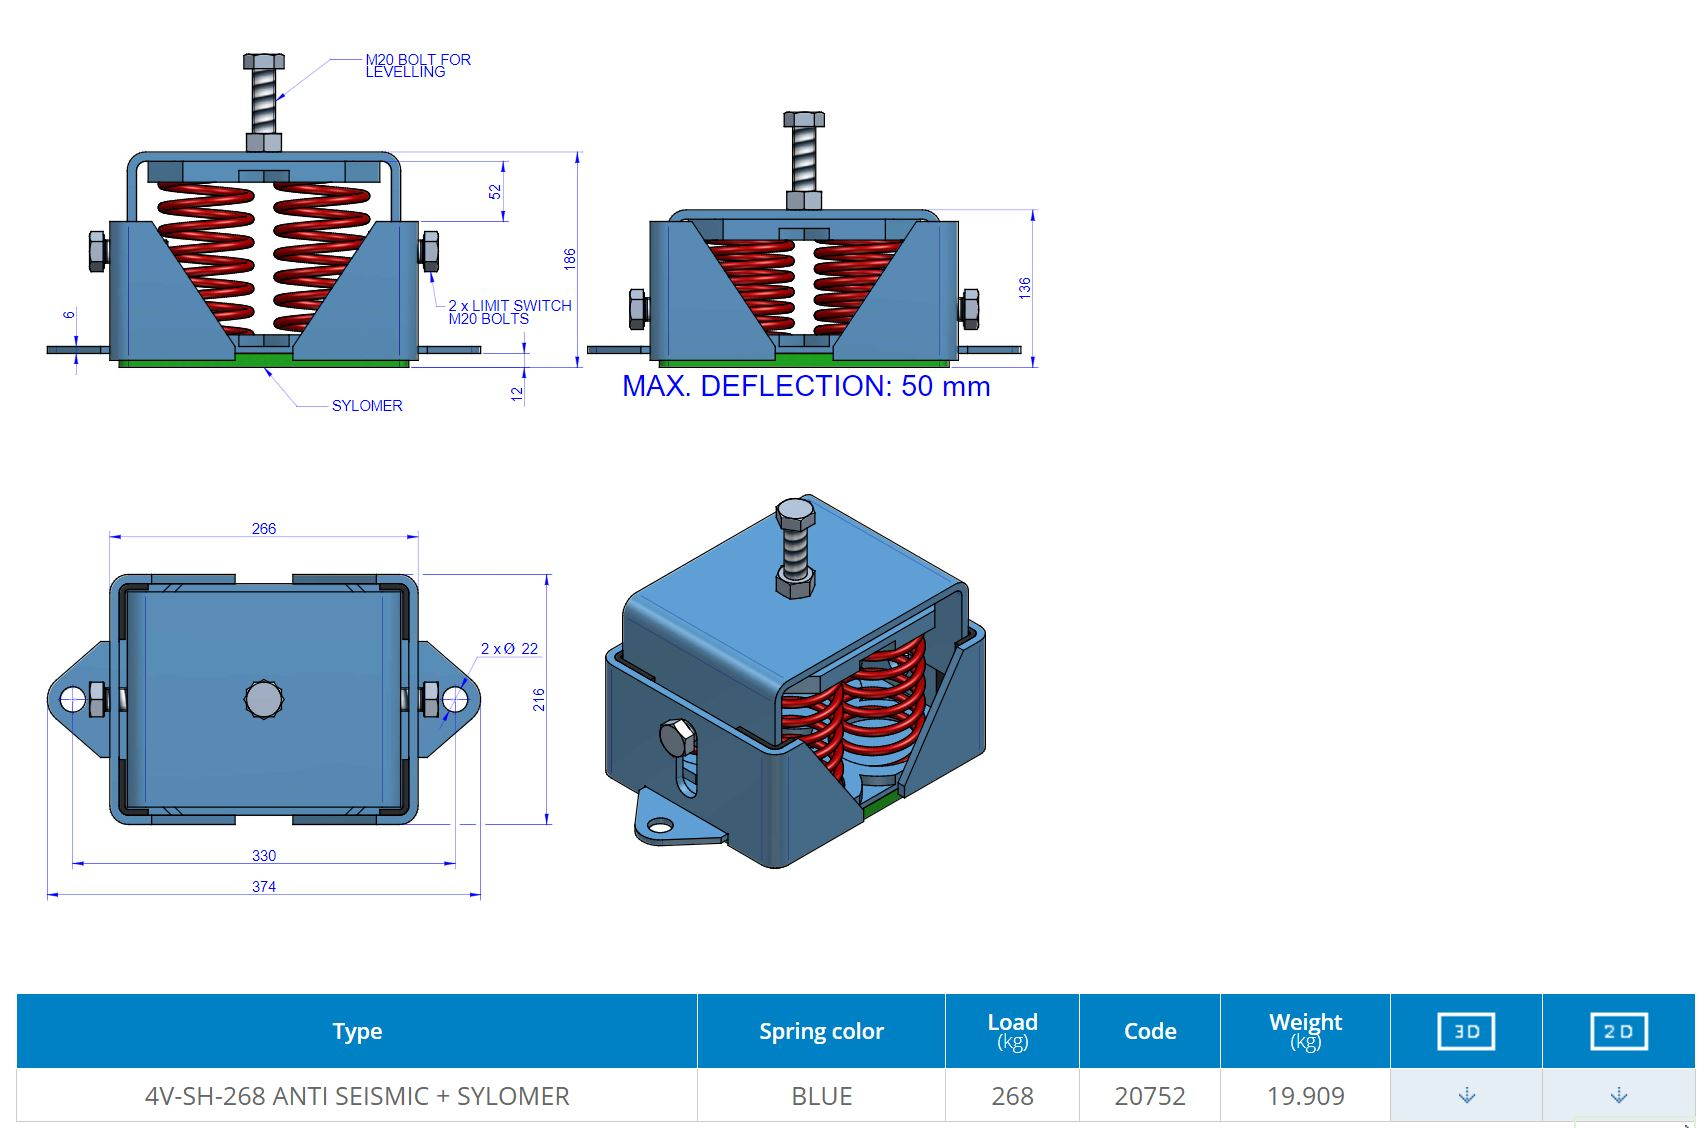 4V-SH-268 Anti Seismic + sylomer